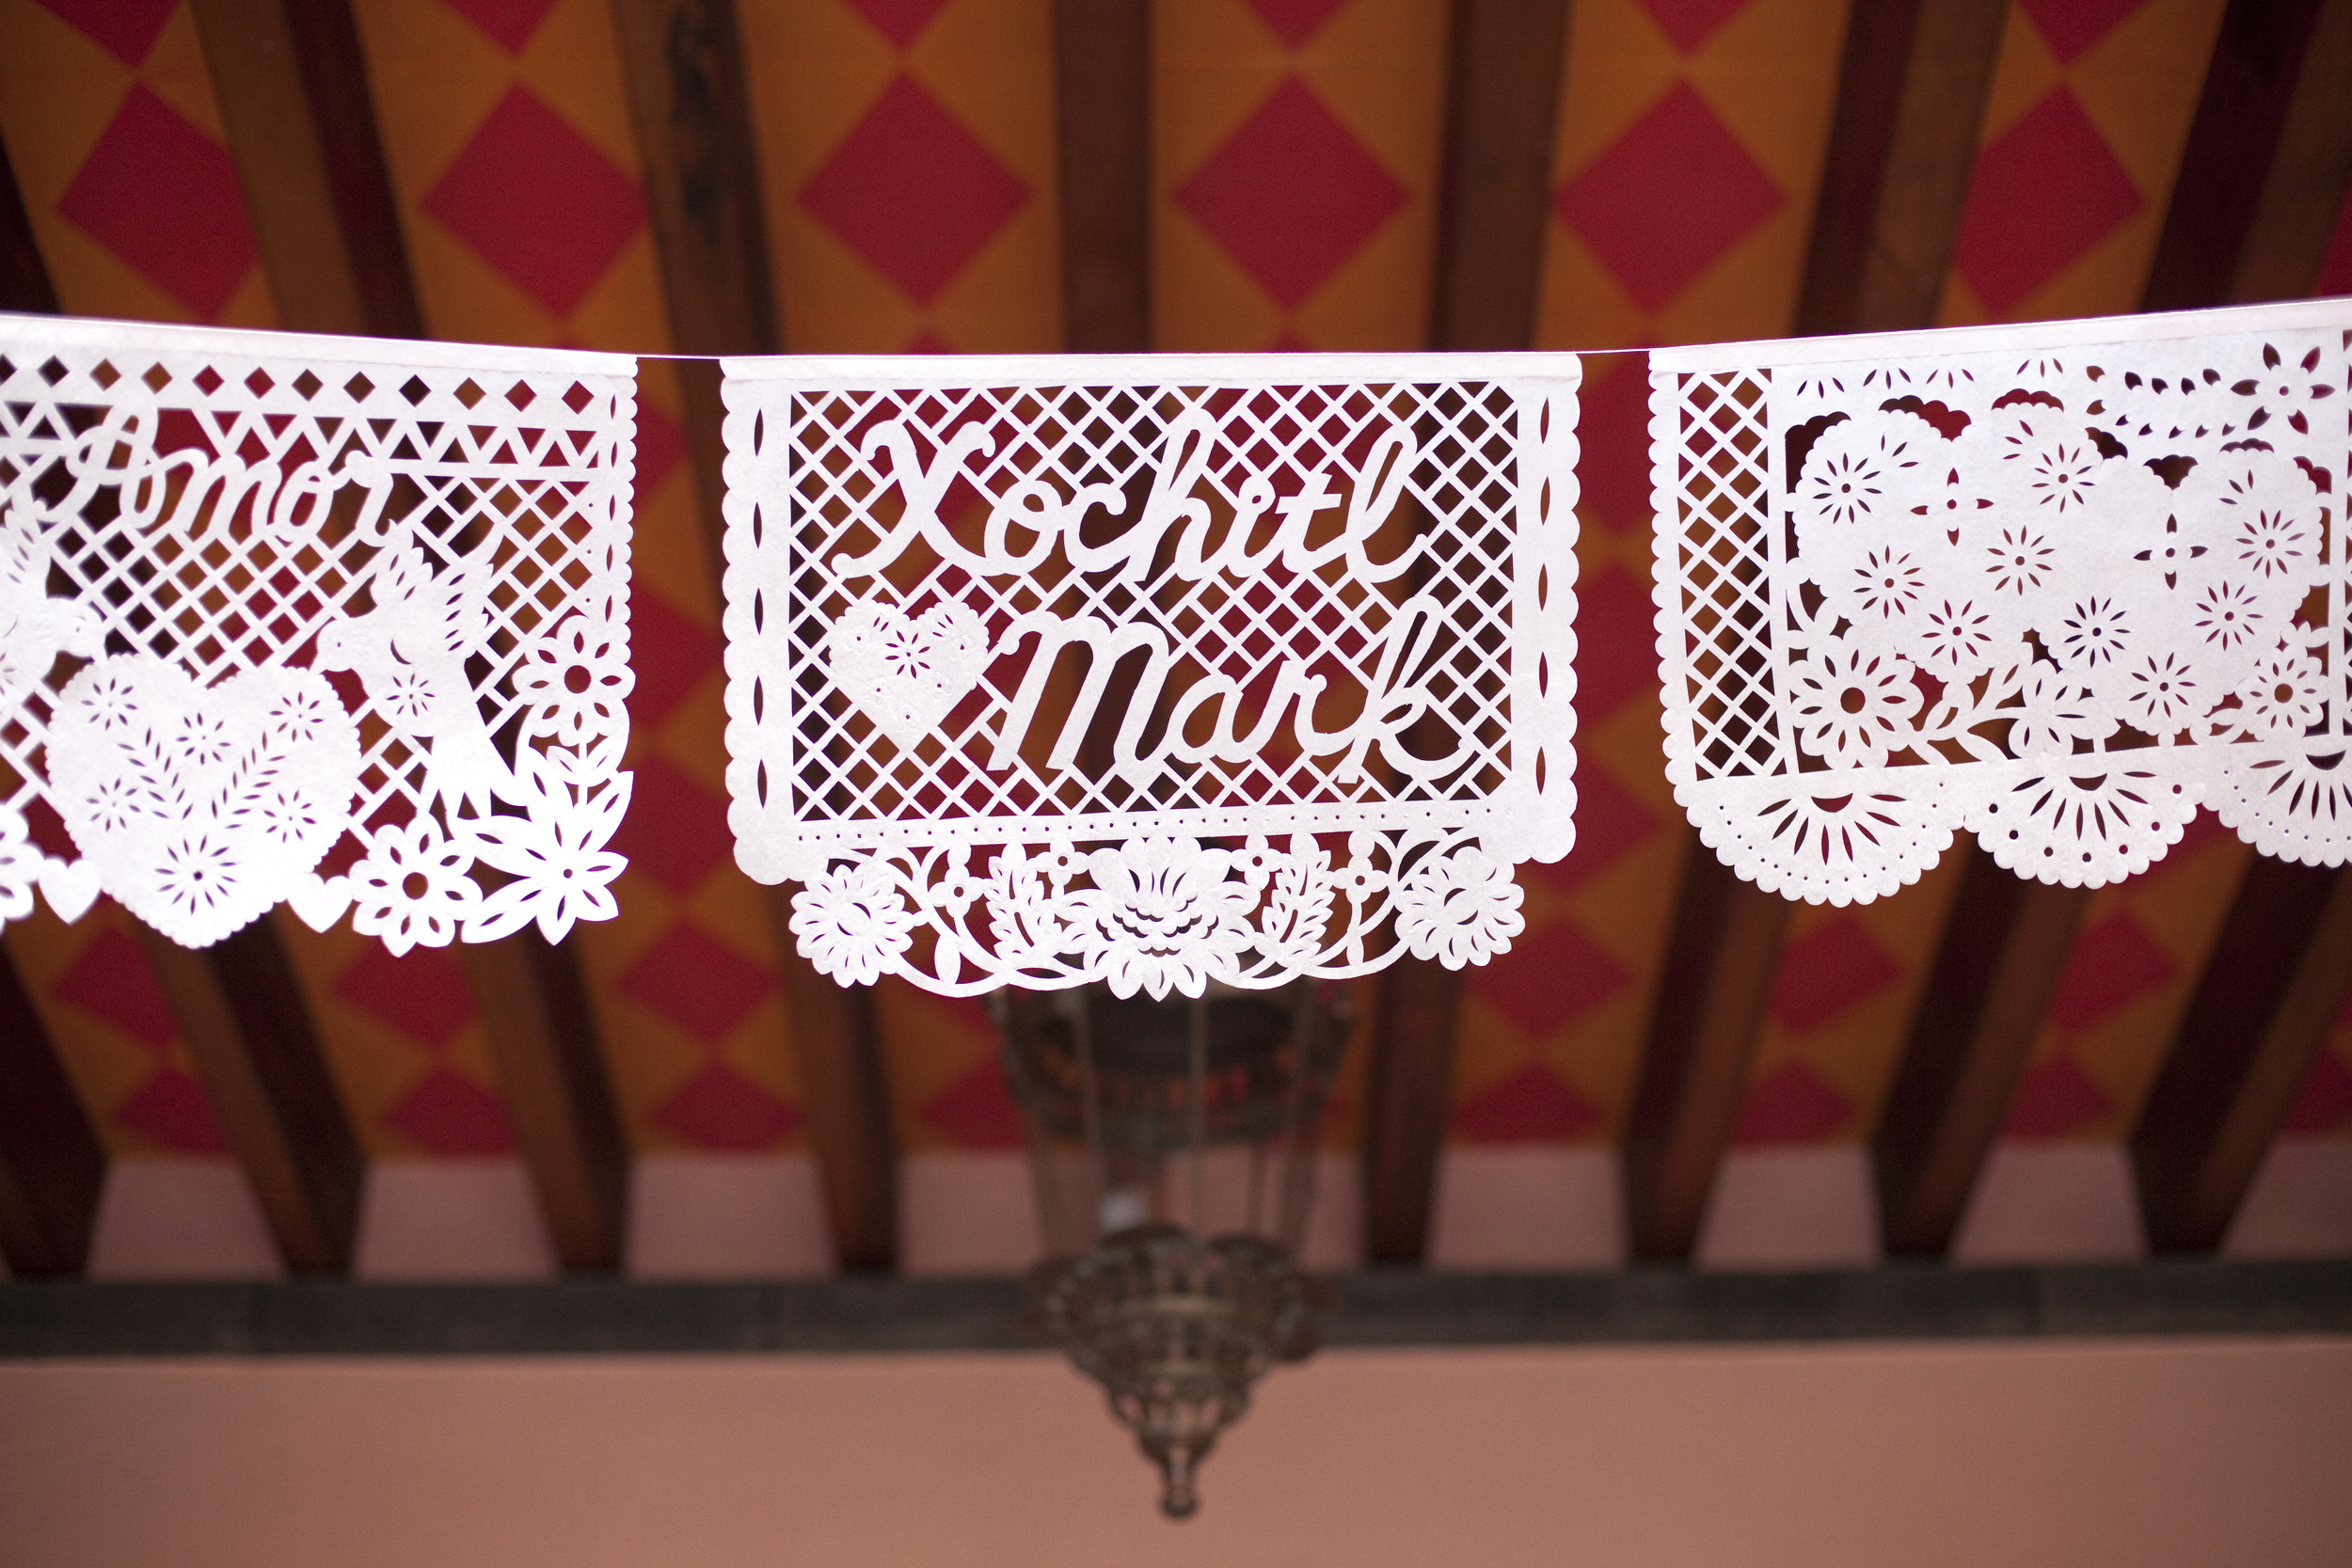 Ceci_New_York_Style_Luxury_Custom_Mexico_Wedding_CeciBride_Letterpress_NewYork_Foil_Hacienda_de_San_Antonio_4.jpg